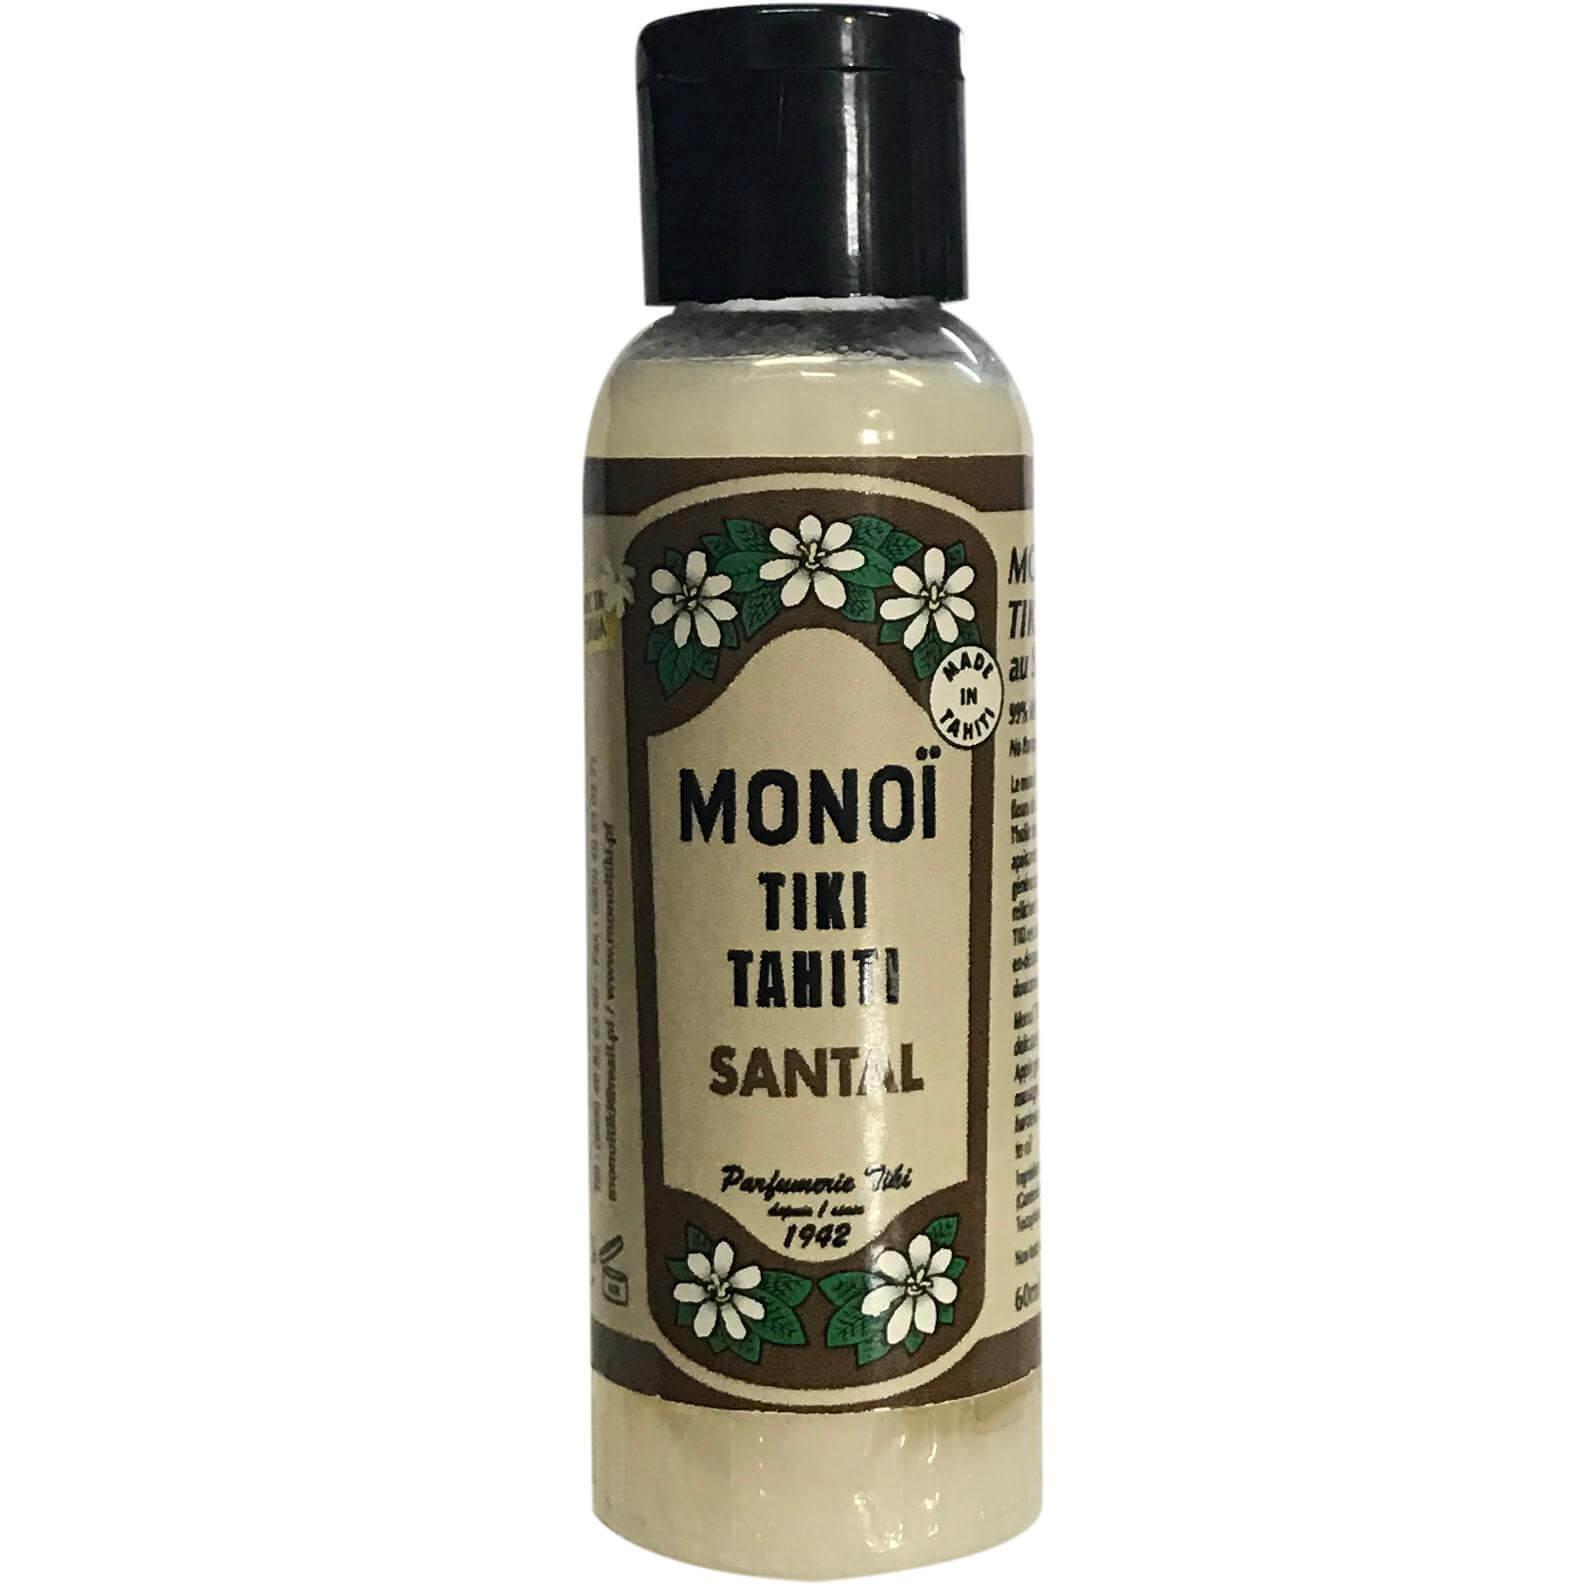 Monoi Tiki Tahiti Sandalwood Ενυδατικό Λάδι Σώματος με Άρωμα Σανταλόξυλο 60ml